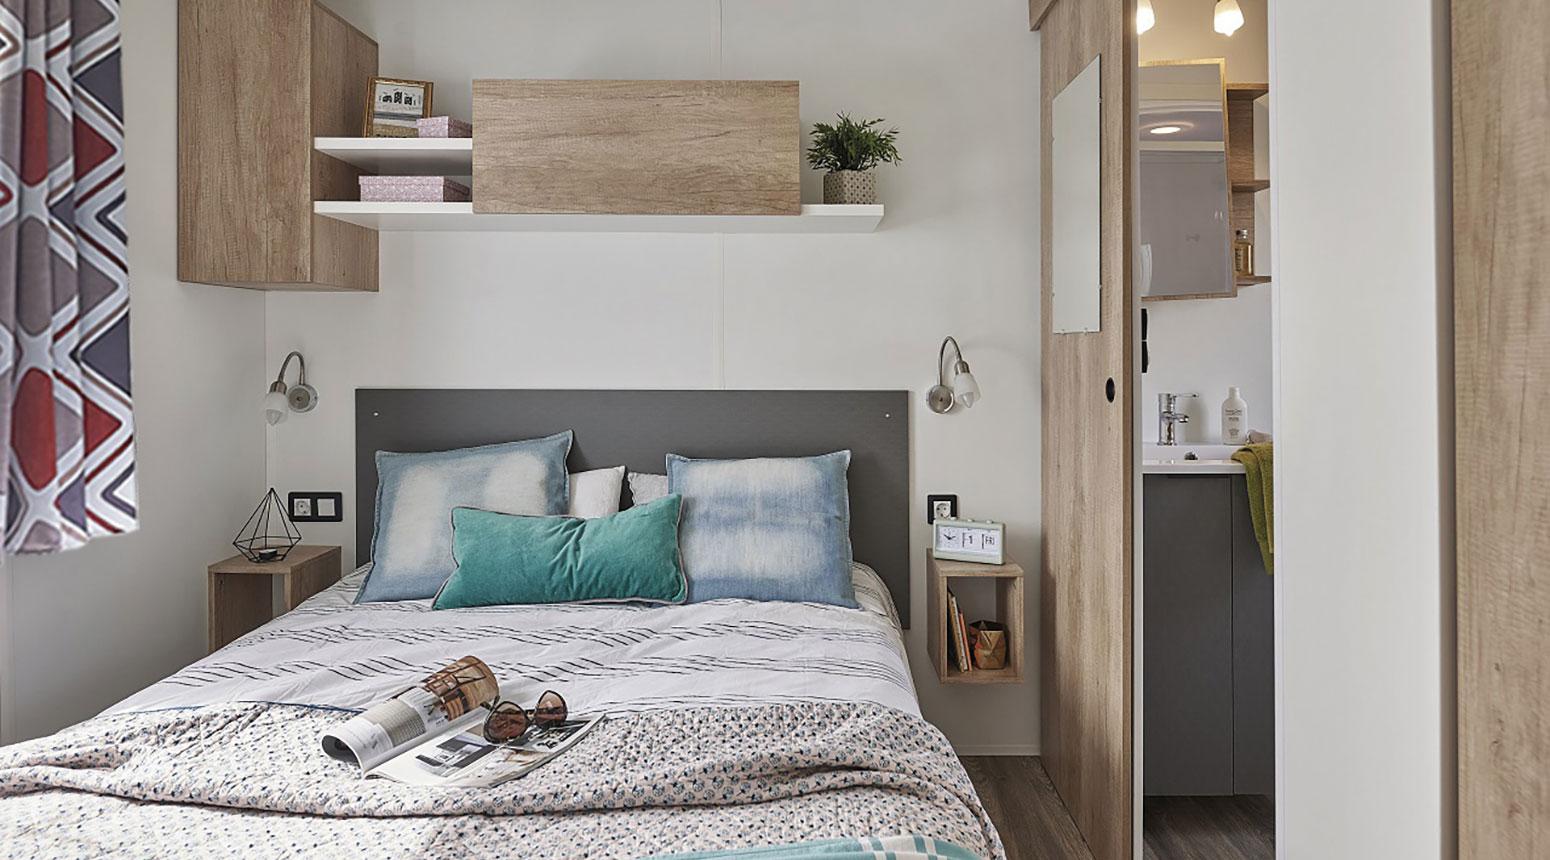 Chambre cocooning bien décorée, vente de mobil home Bidart Camping Le Ruisseau